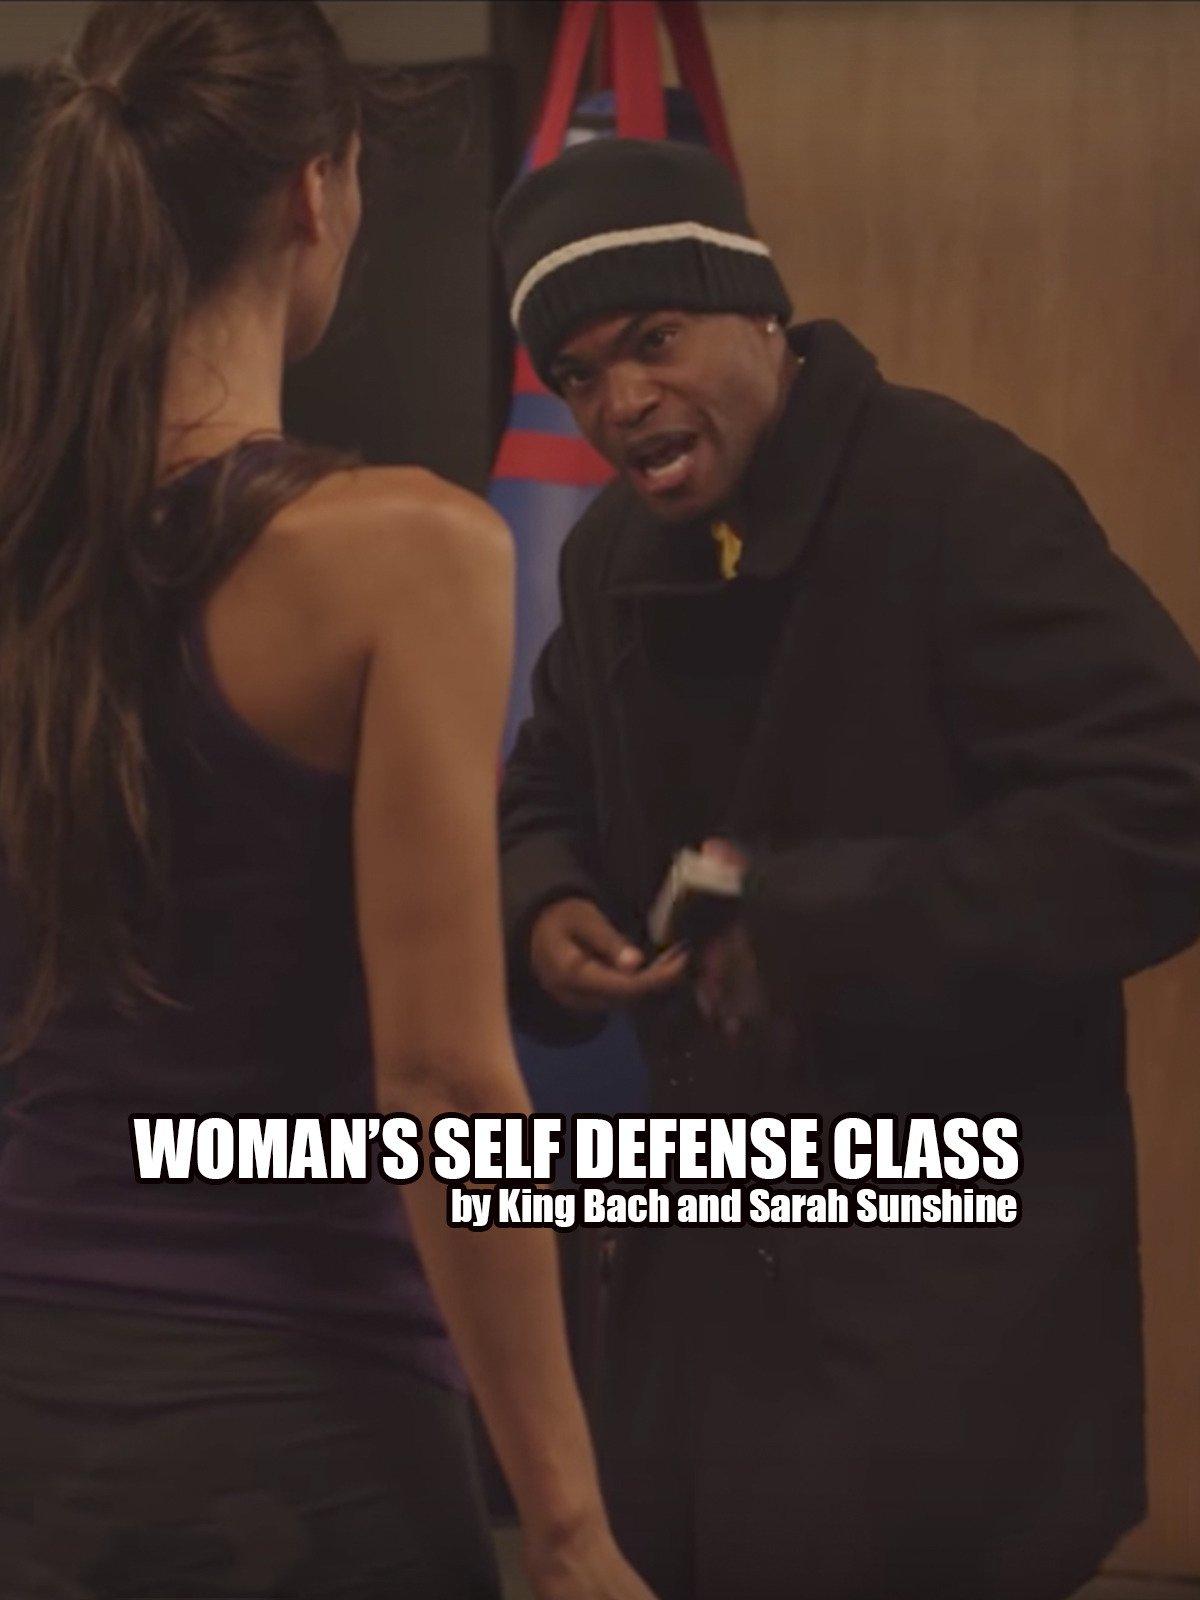 Woman's Self Defense Class ft. King Bach and Sarah Sunshine